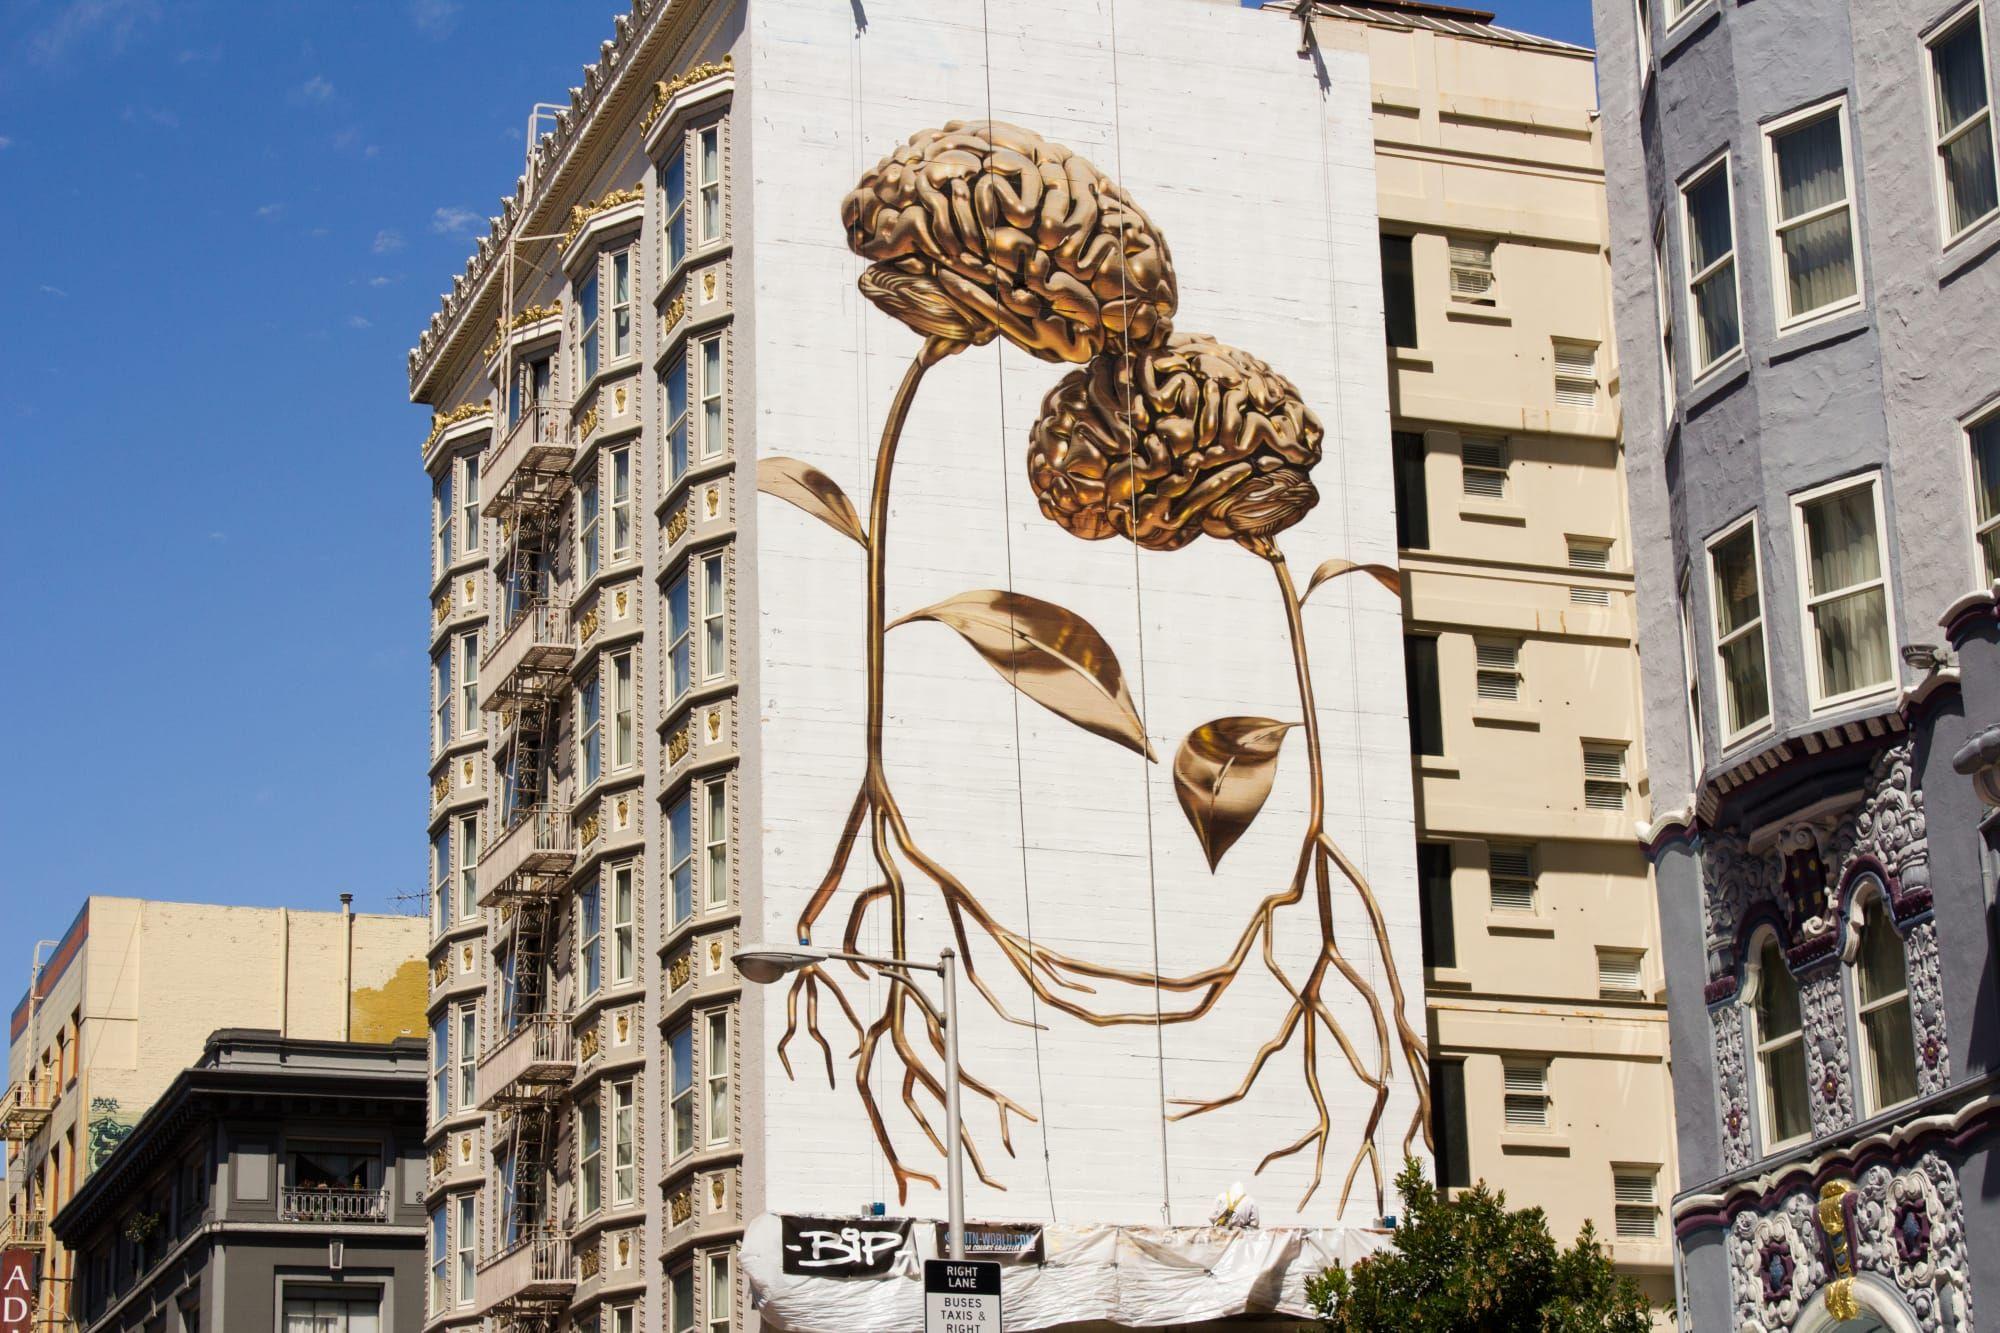 Figurine By Bip At The Alise San Francisco A Staypineapple Hotel San Francisco Graffiti Images Graffiti Street Art